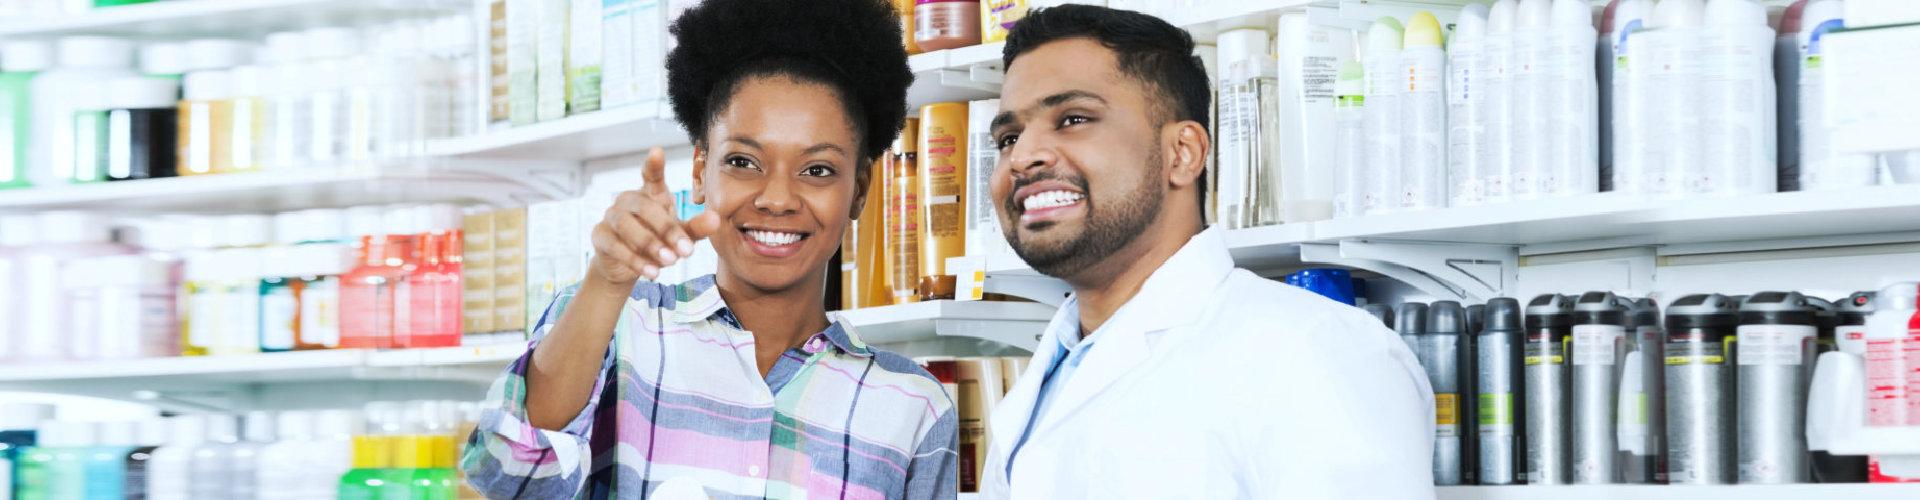 customer and a pharmacist